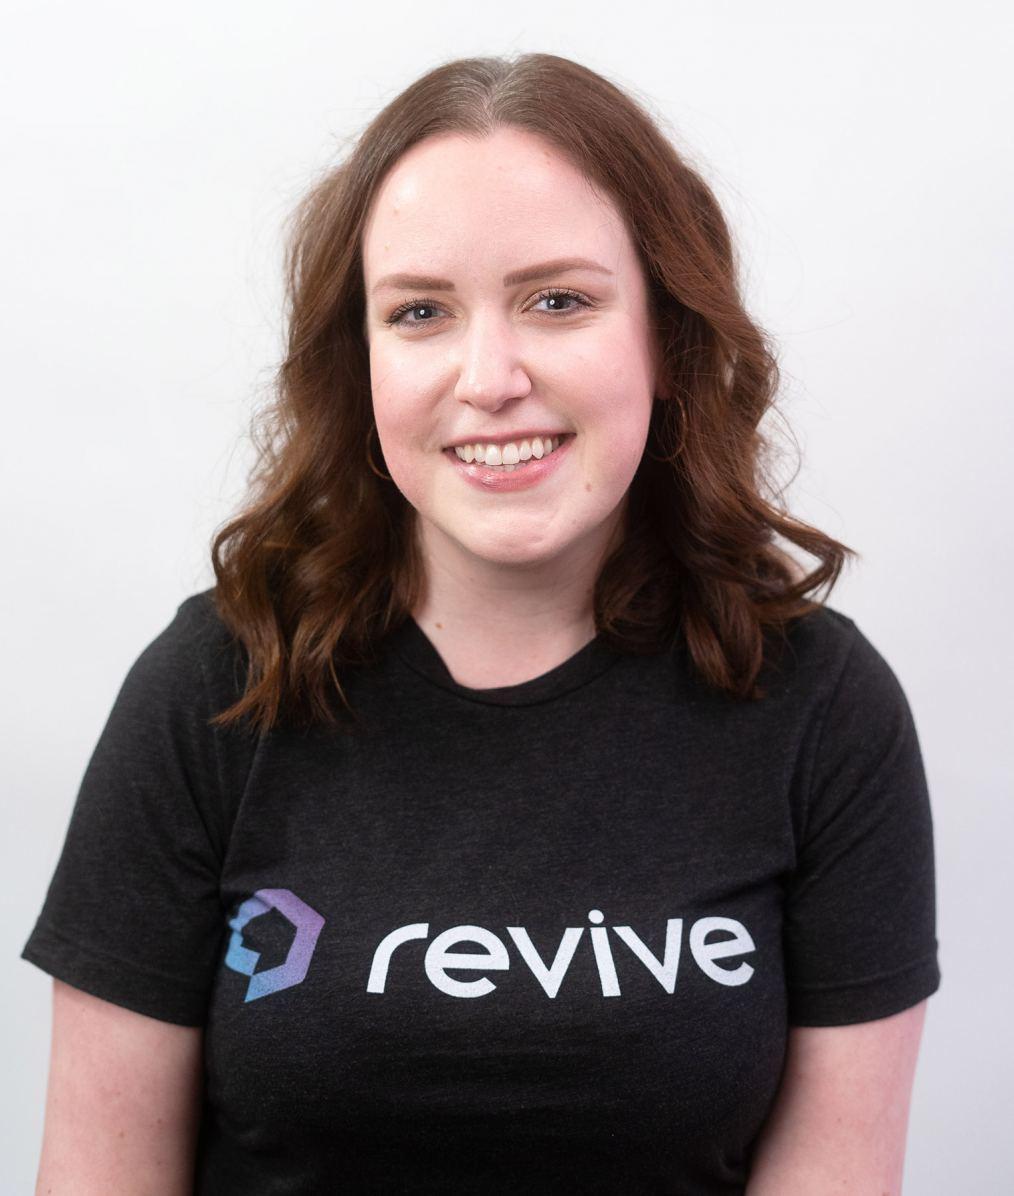 Lauren Baltzell, Designer and Project Manager